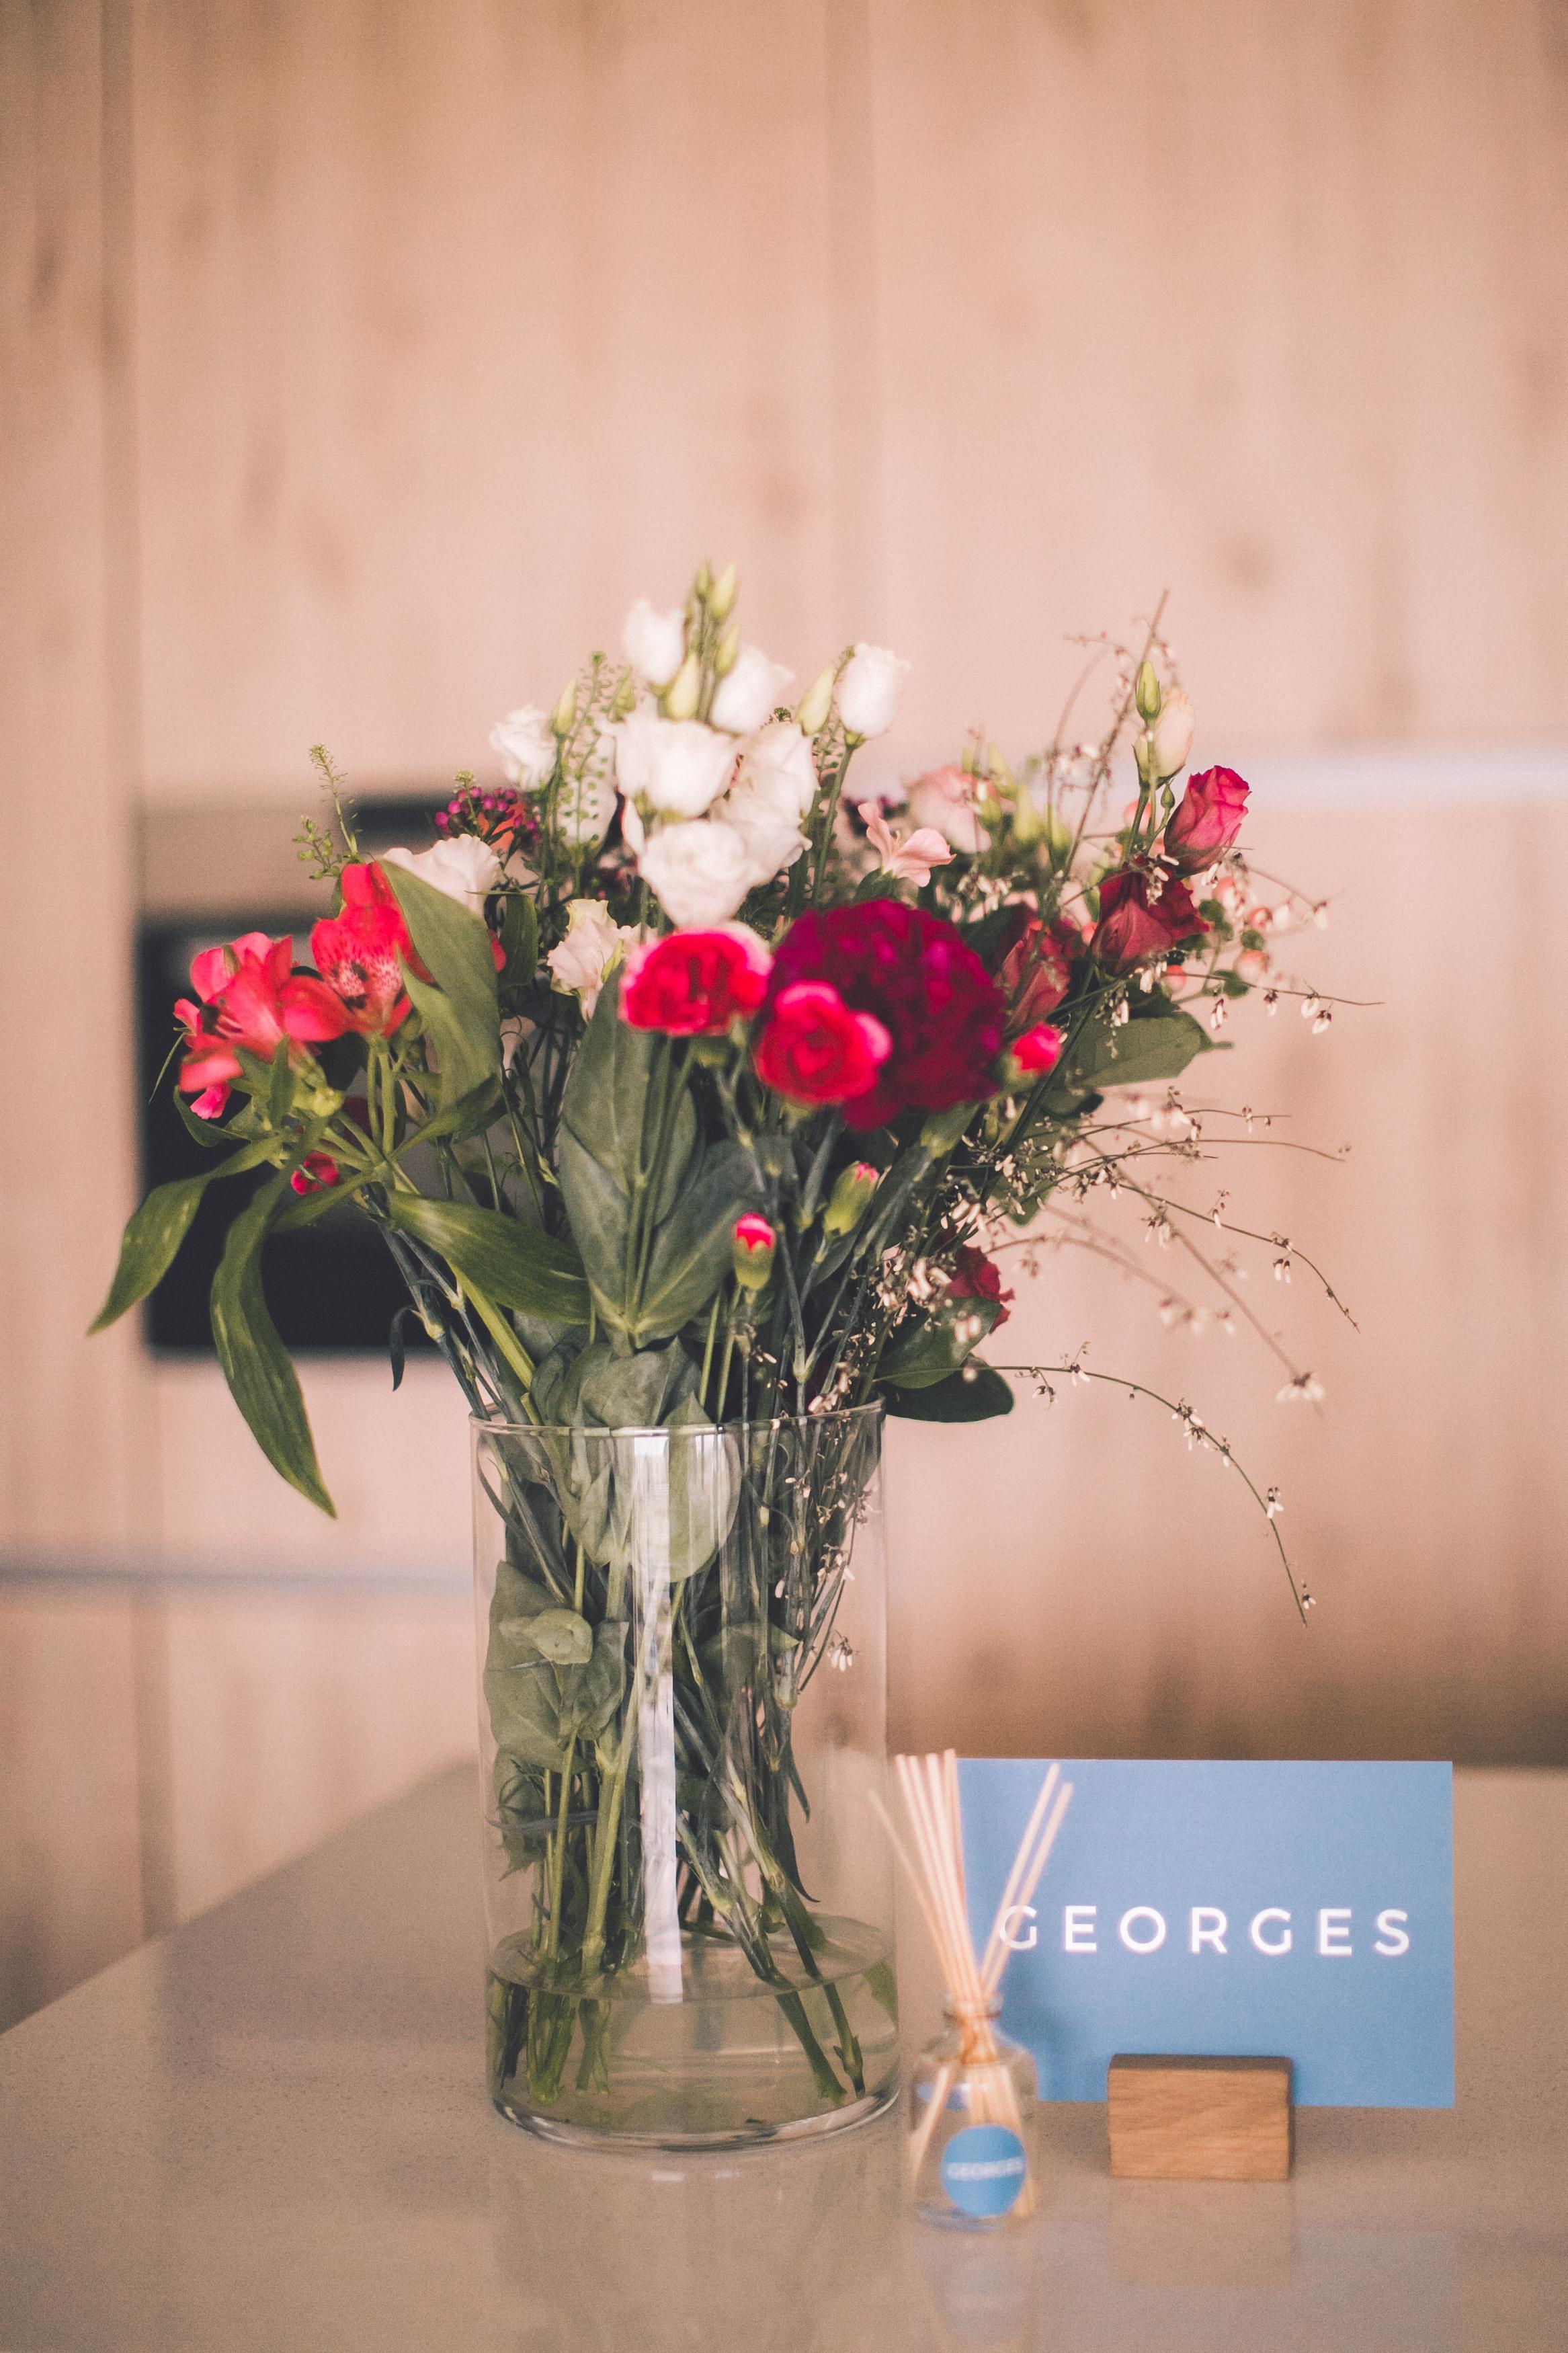 GEORGES-2510